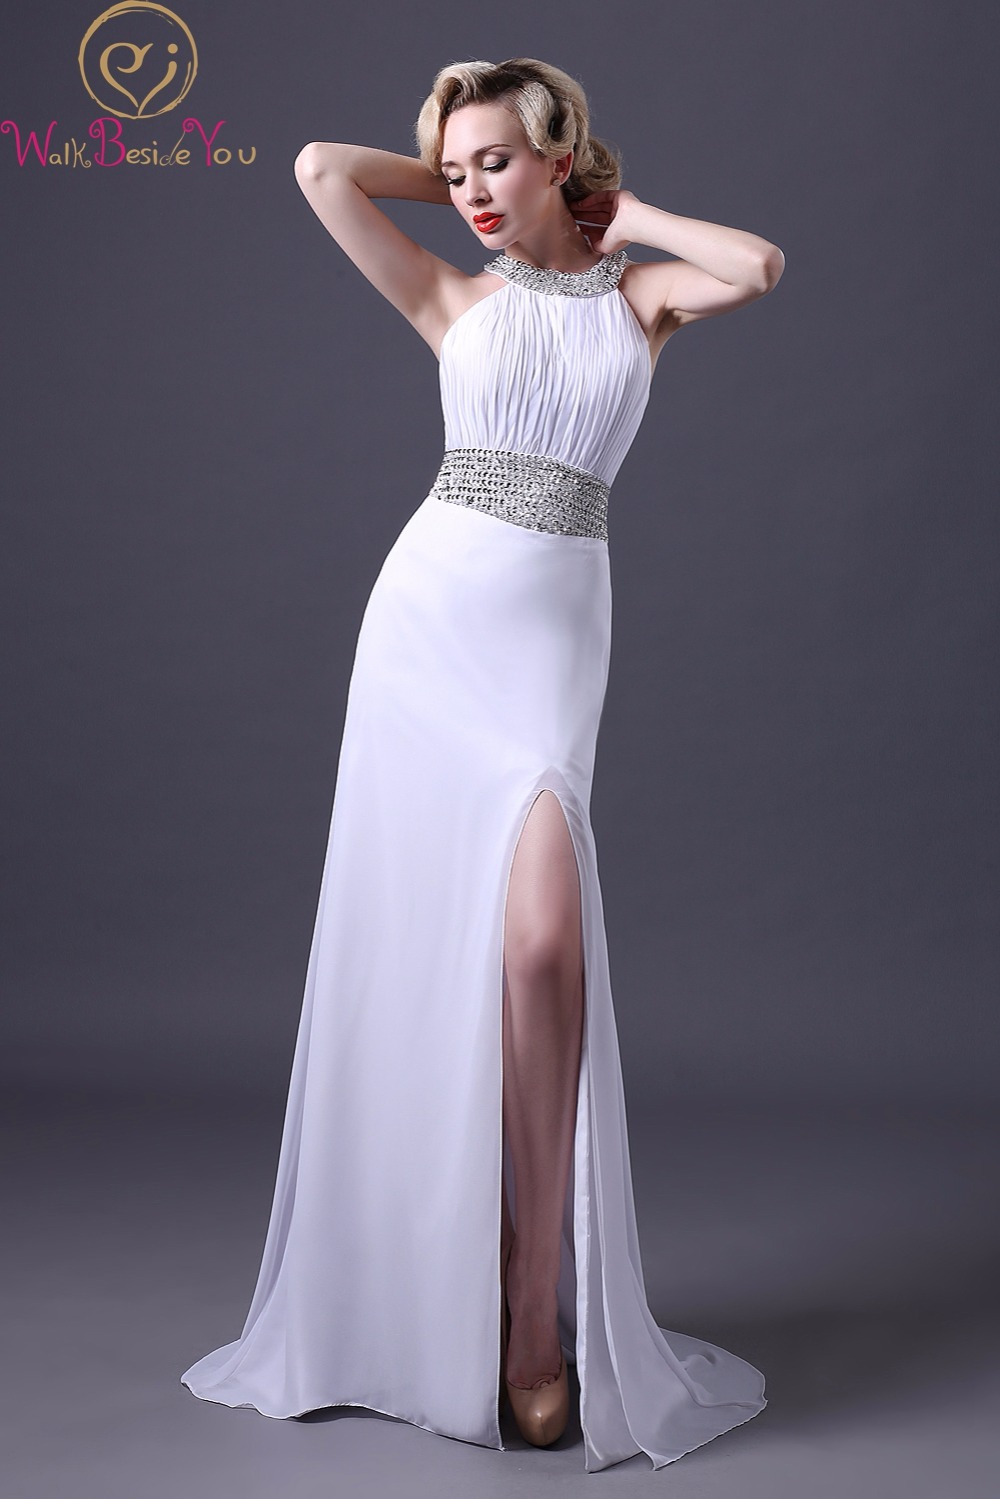 Hermosa Prom Blanco Vestido De Reino Unido Ornamento - Vestido de ...